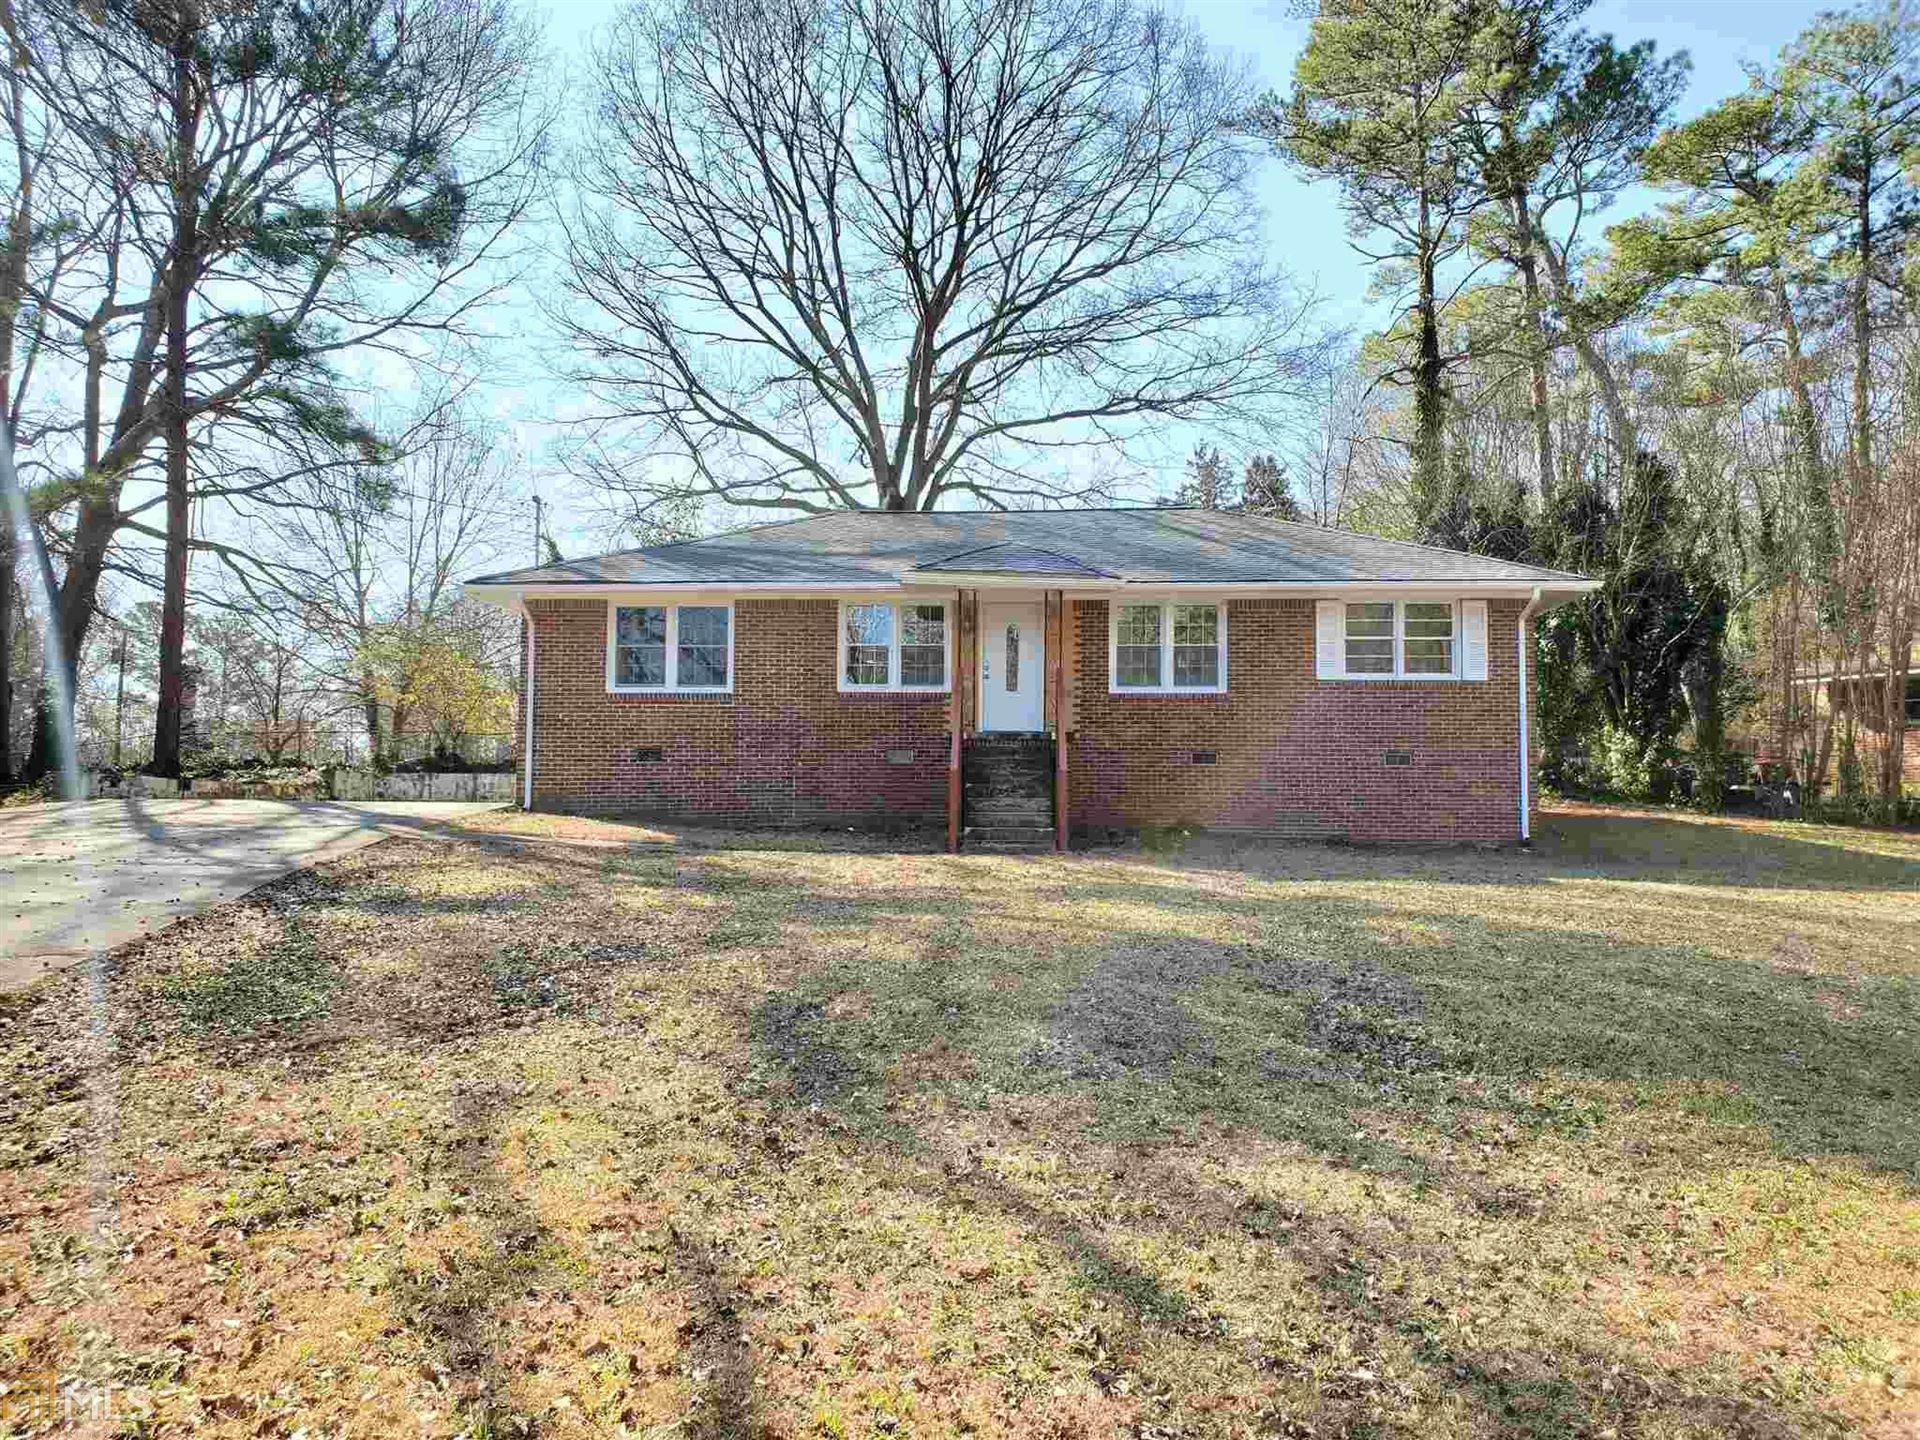 1367 Oakview Dr, Forest Park, GA 30297 - MLS#: 8914892